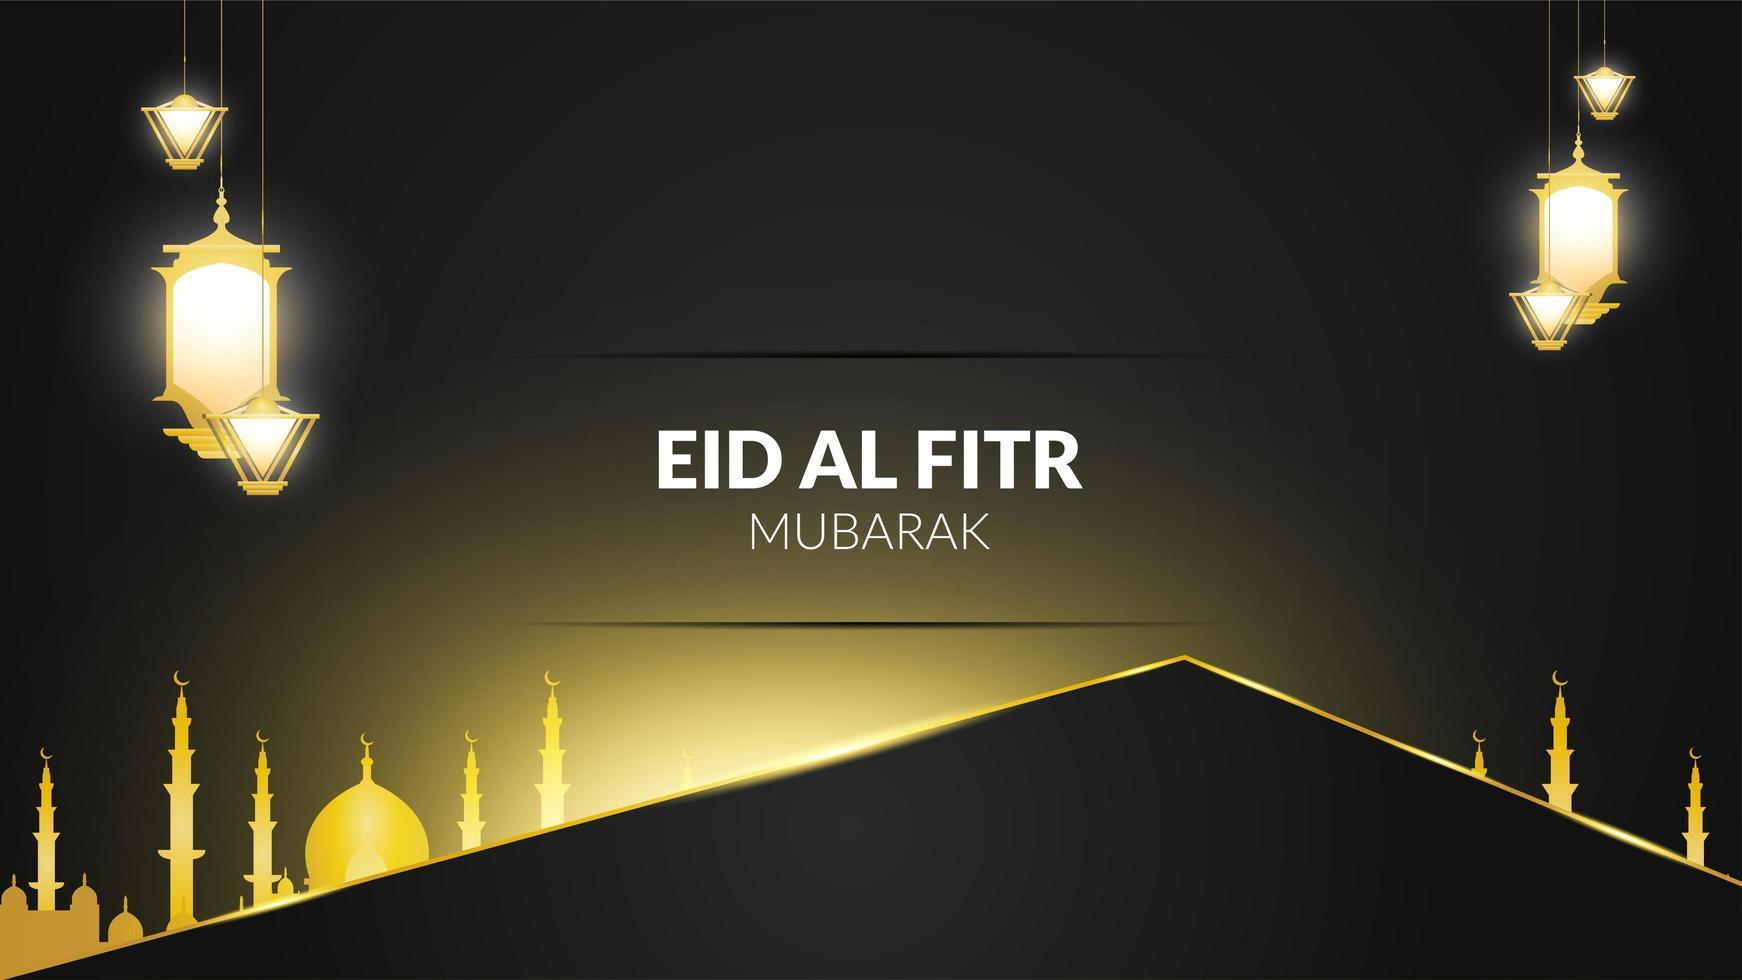 eid al-fitr schwarze und goldene Laternen vektor